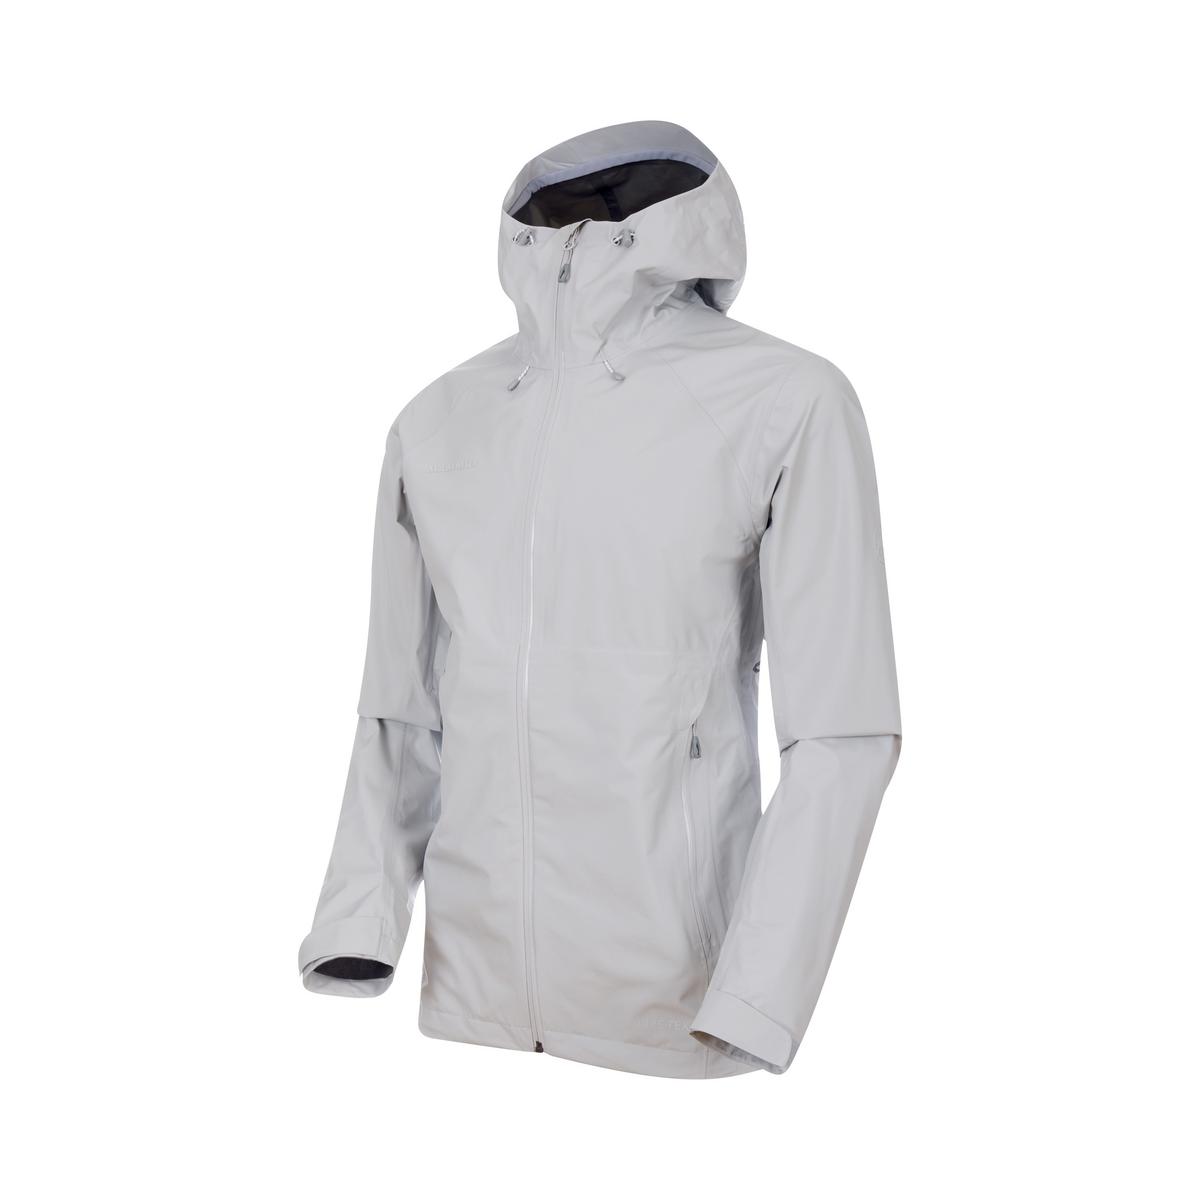 Men Tour Hooded Jacket Convey Hs KclTF1J